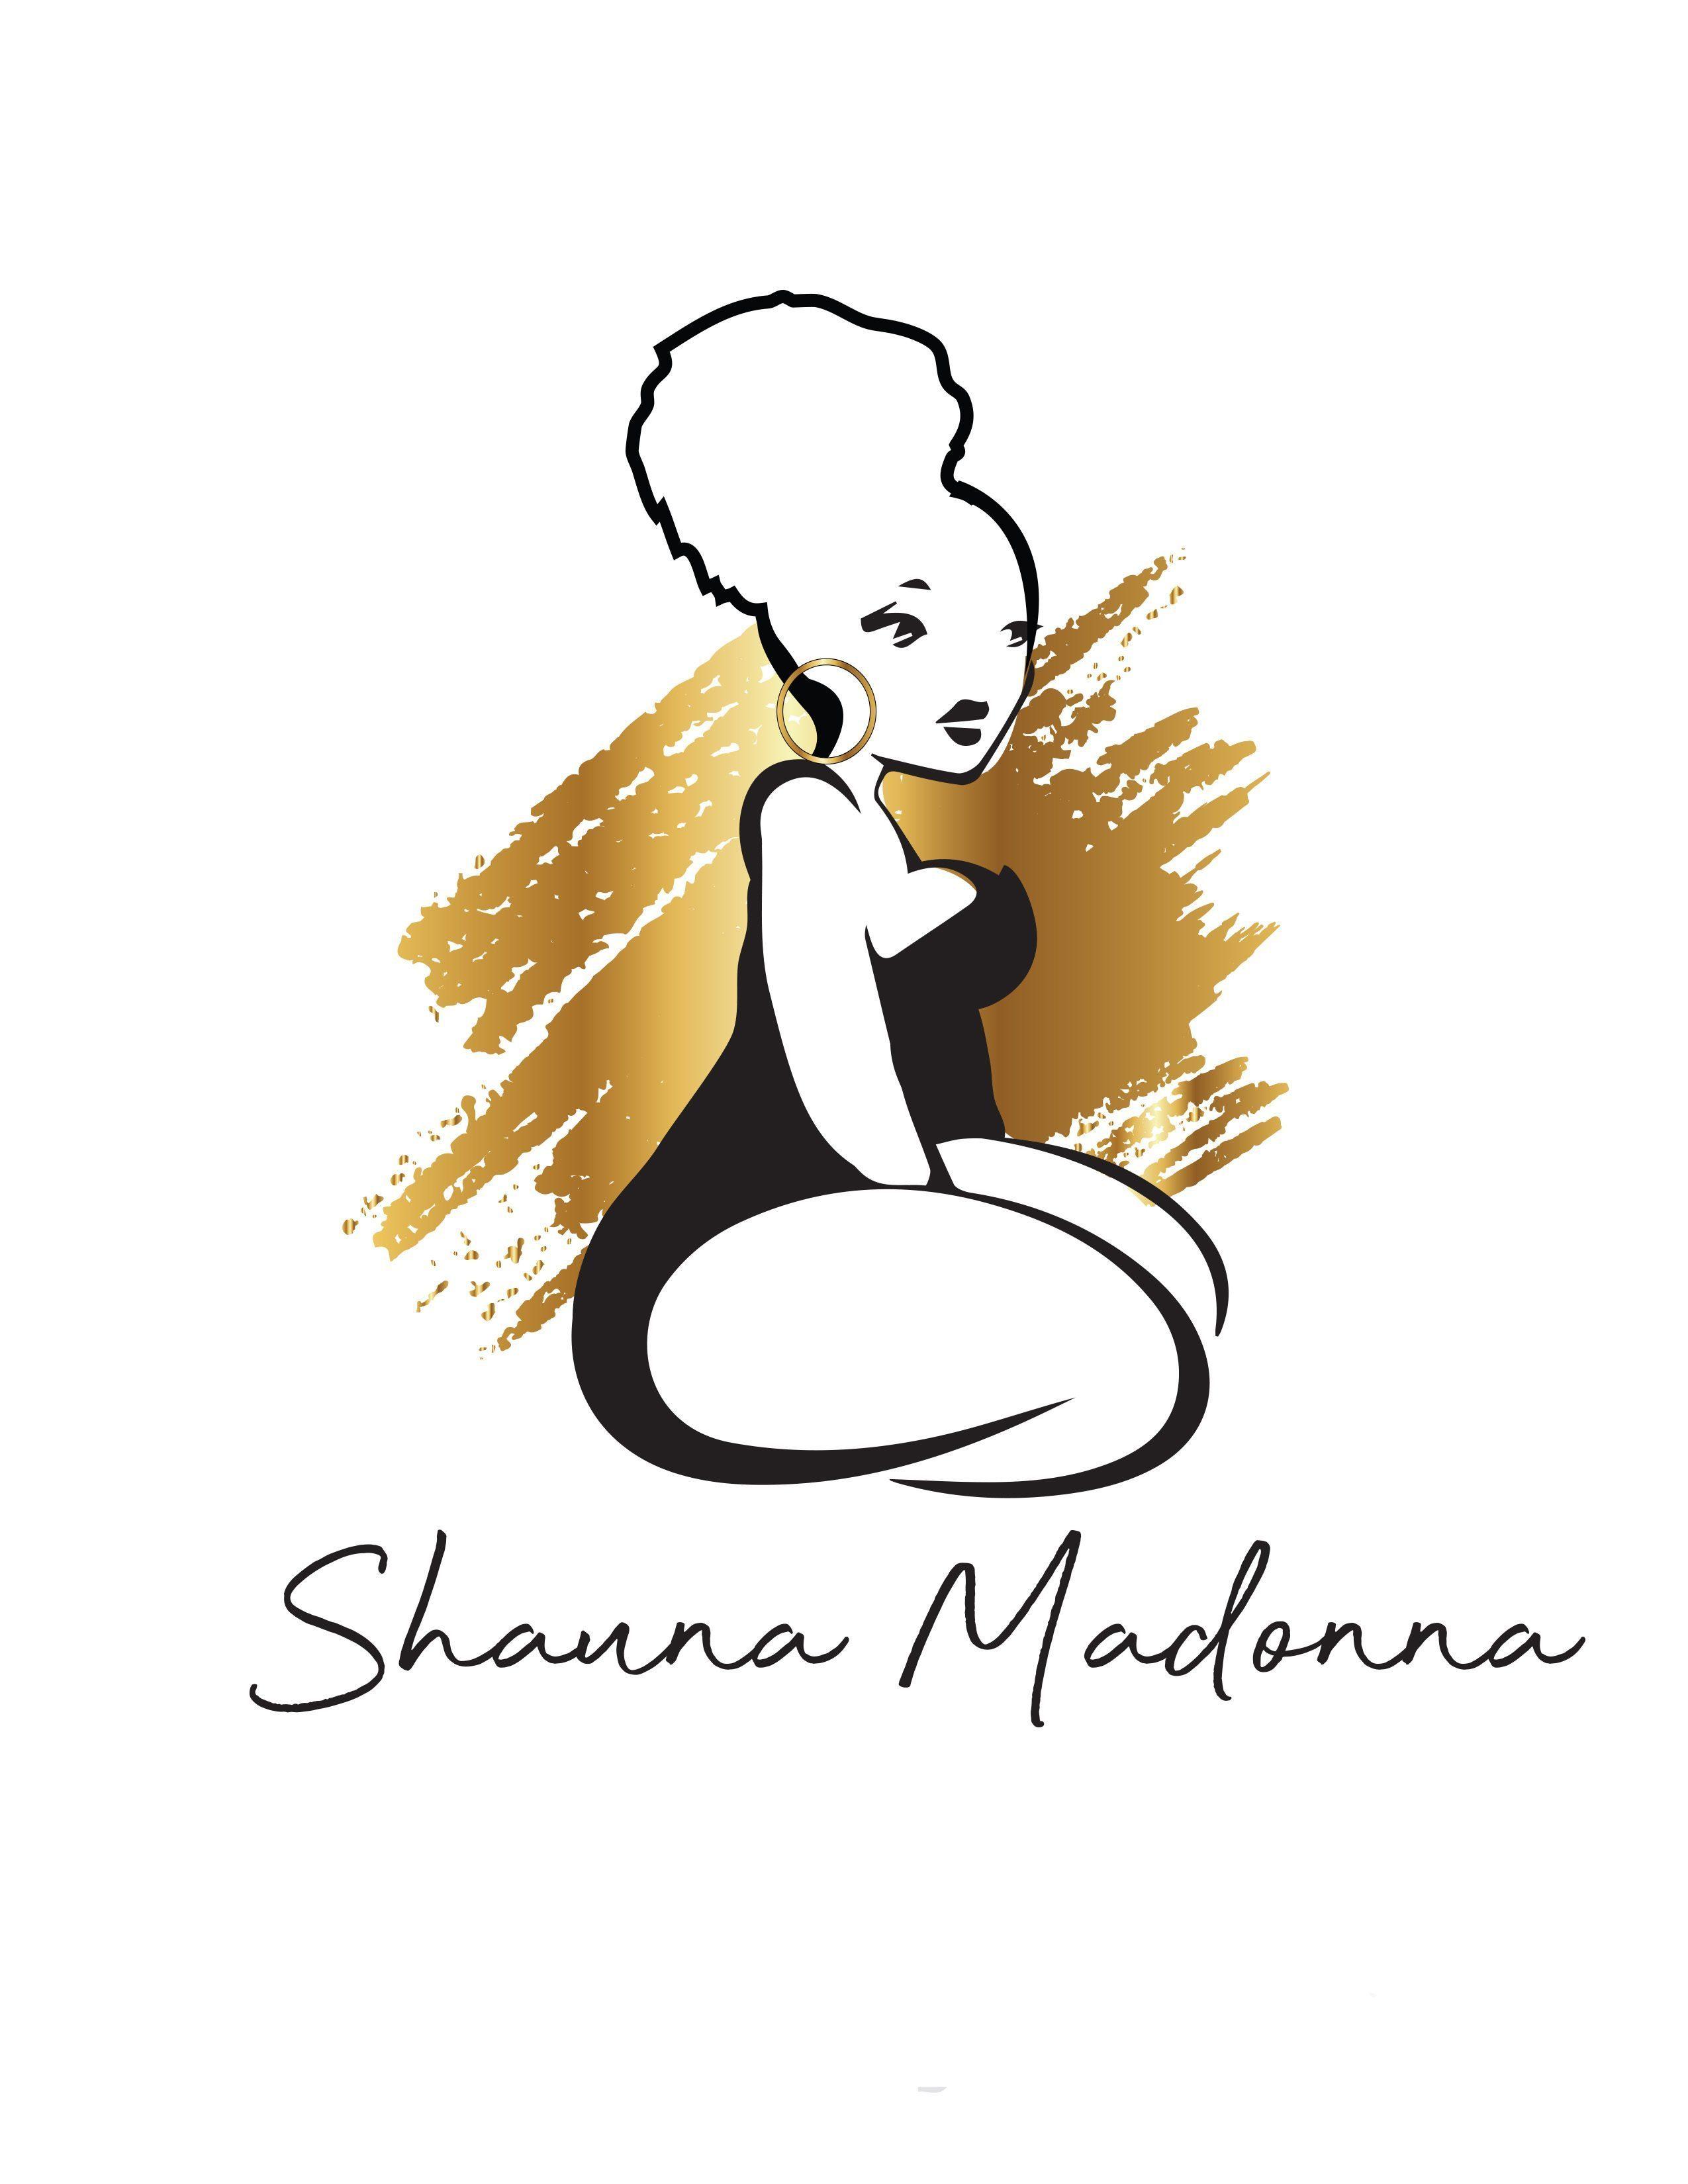 Shauna Madonna